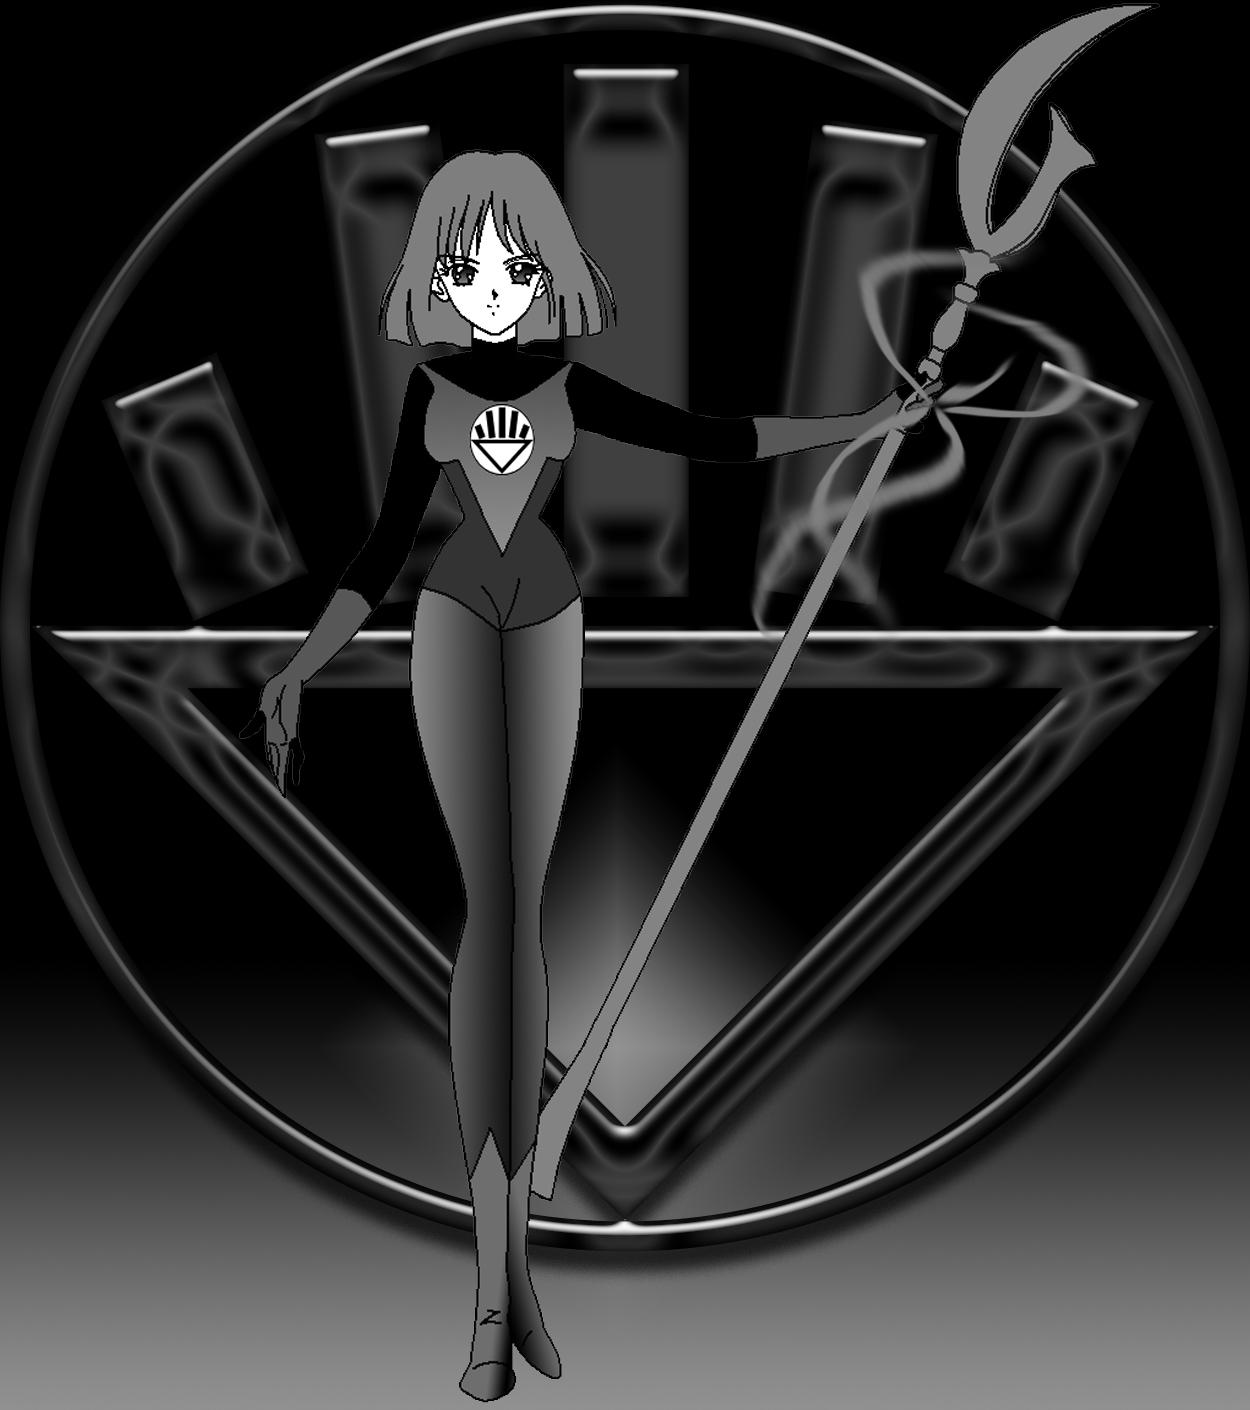 Black lantern oath - photo#20